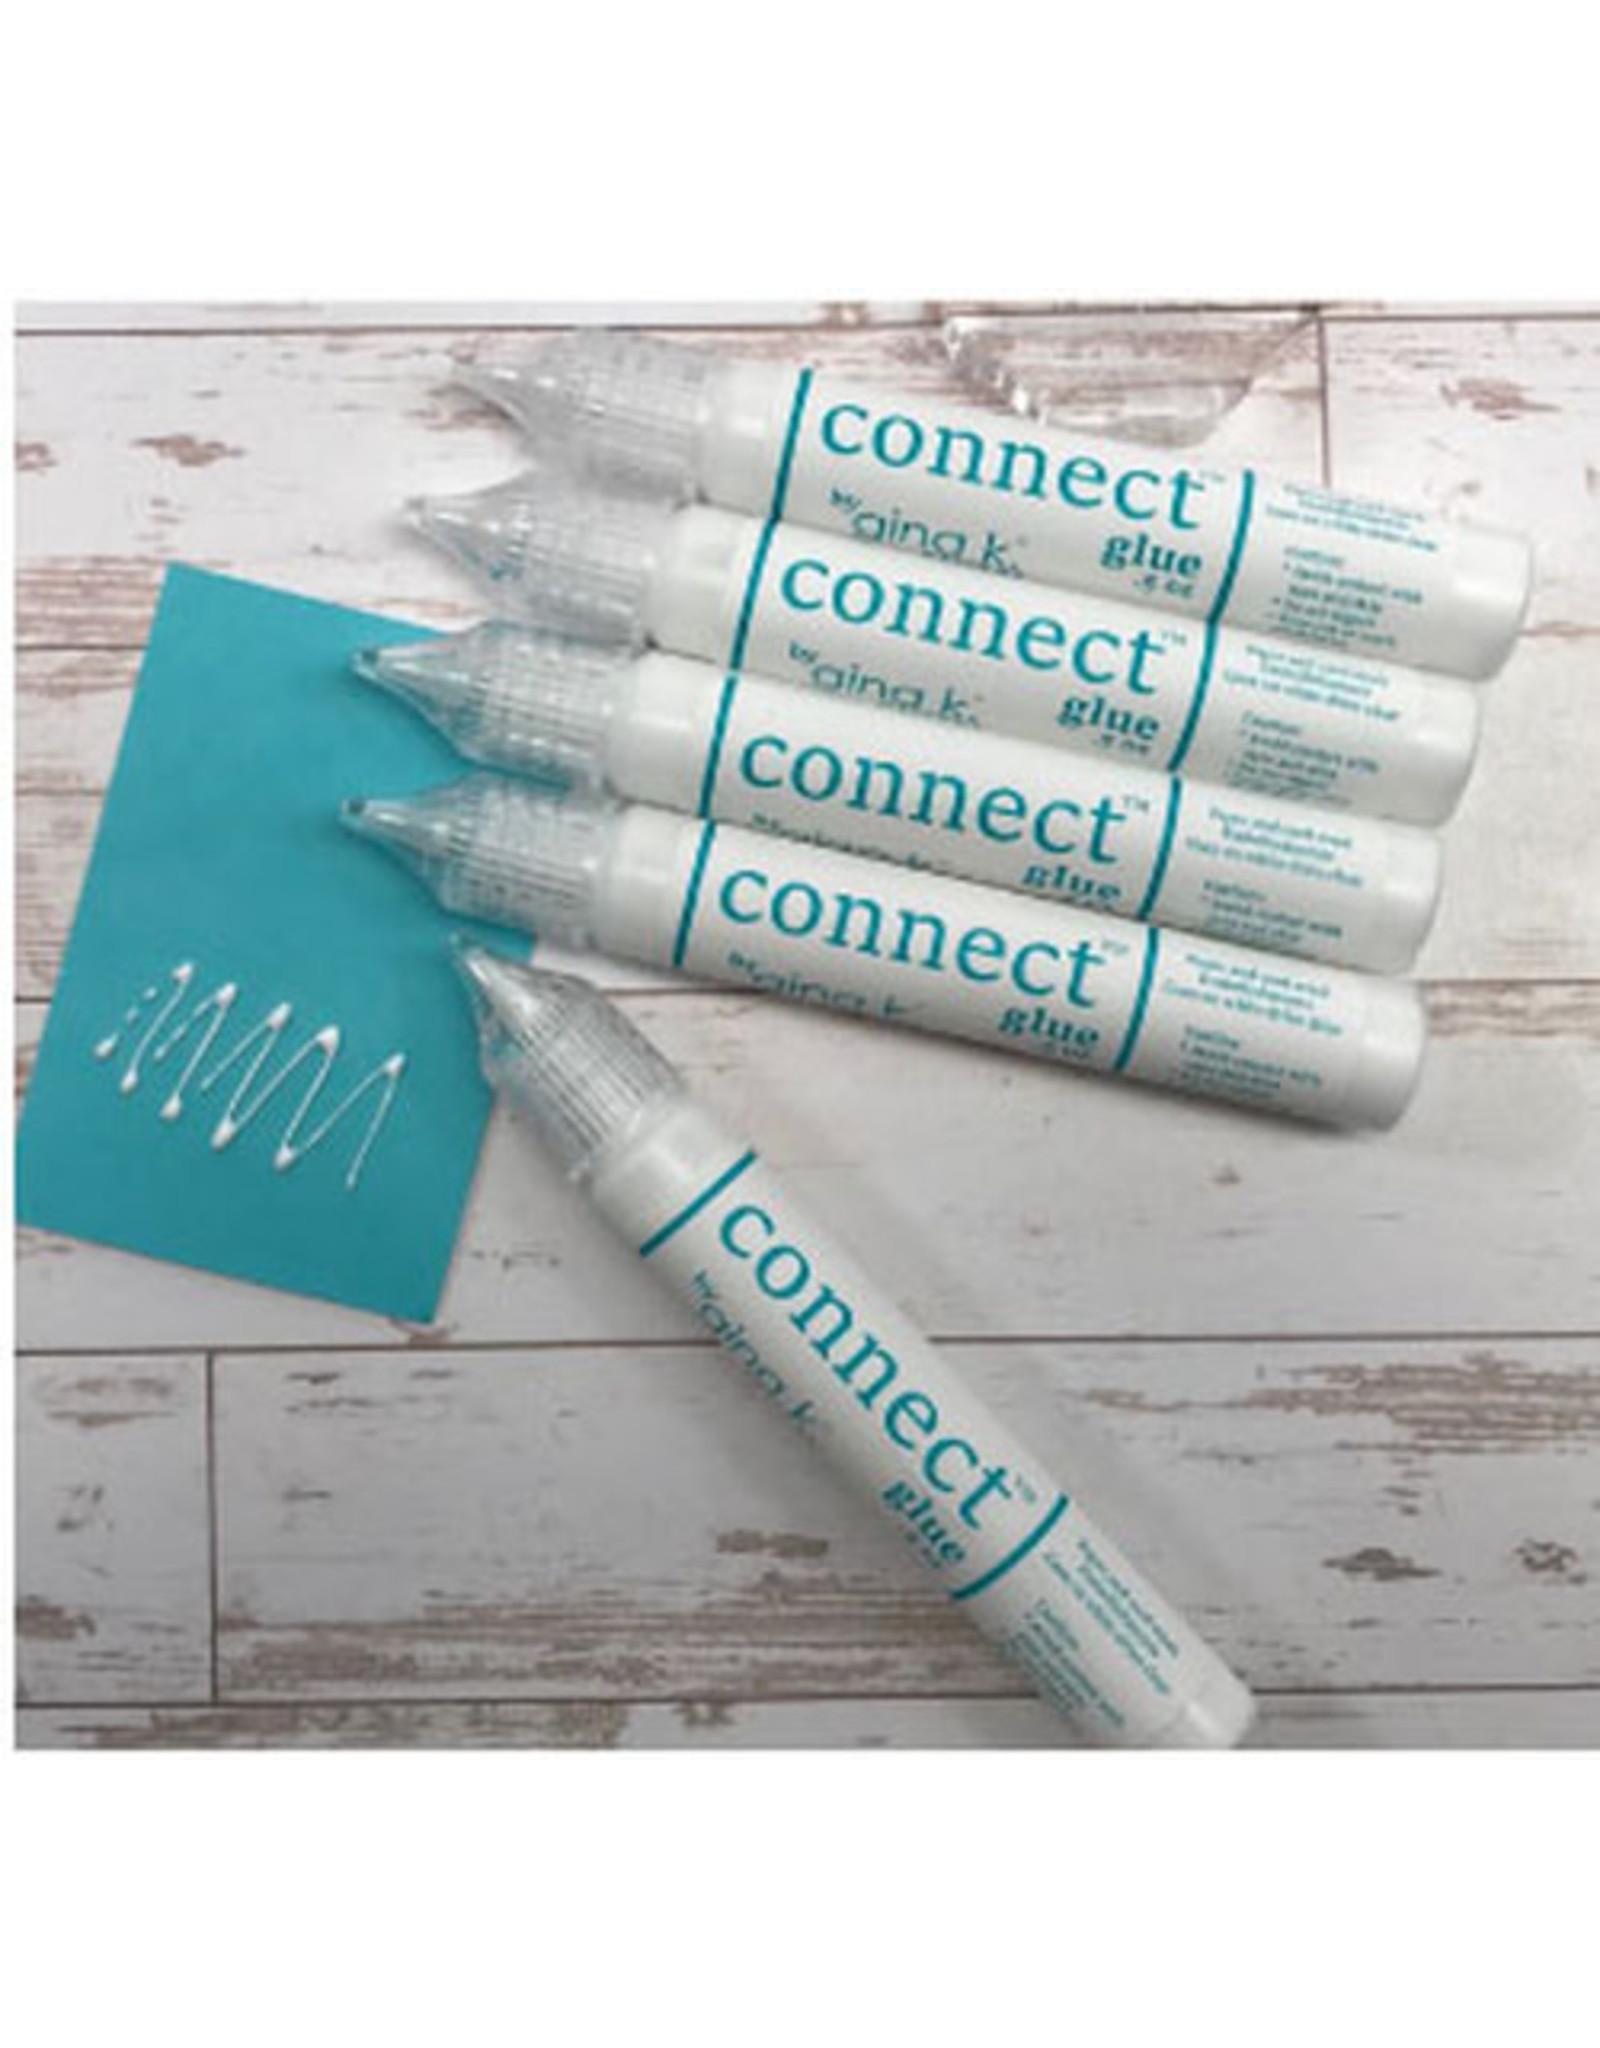 Gina K Designs LLC Connect Glue